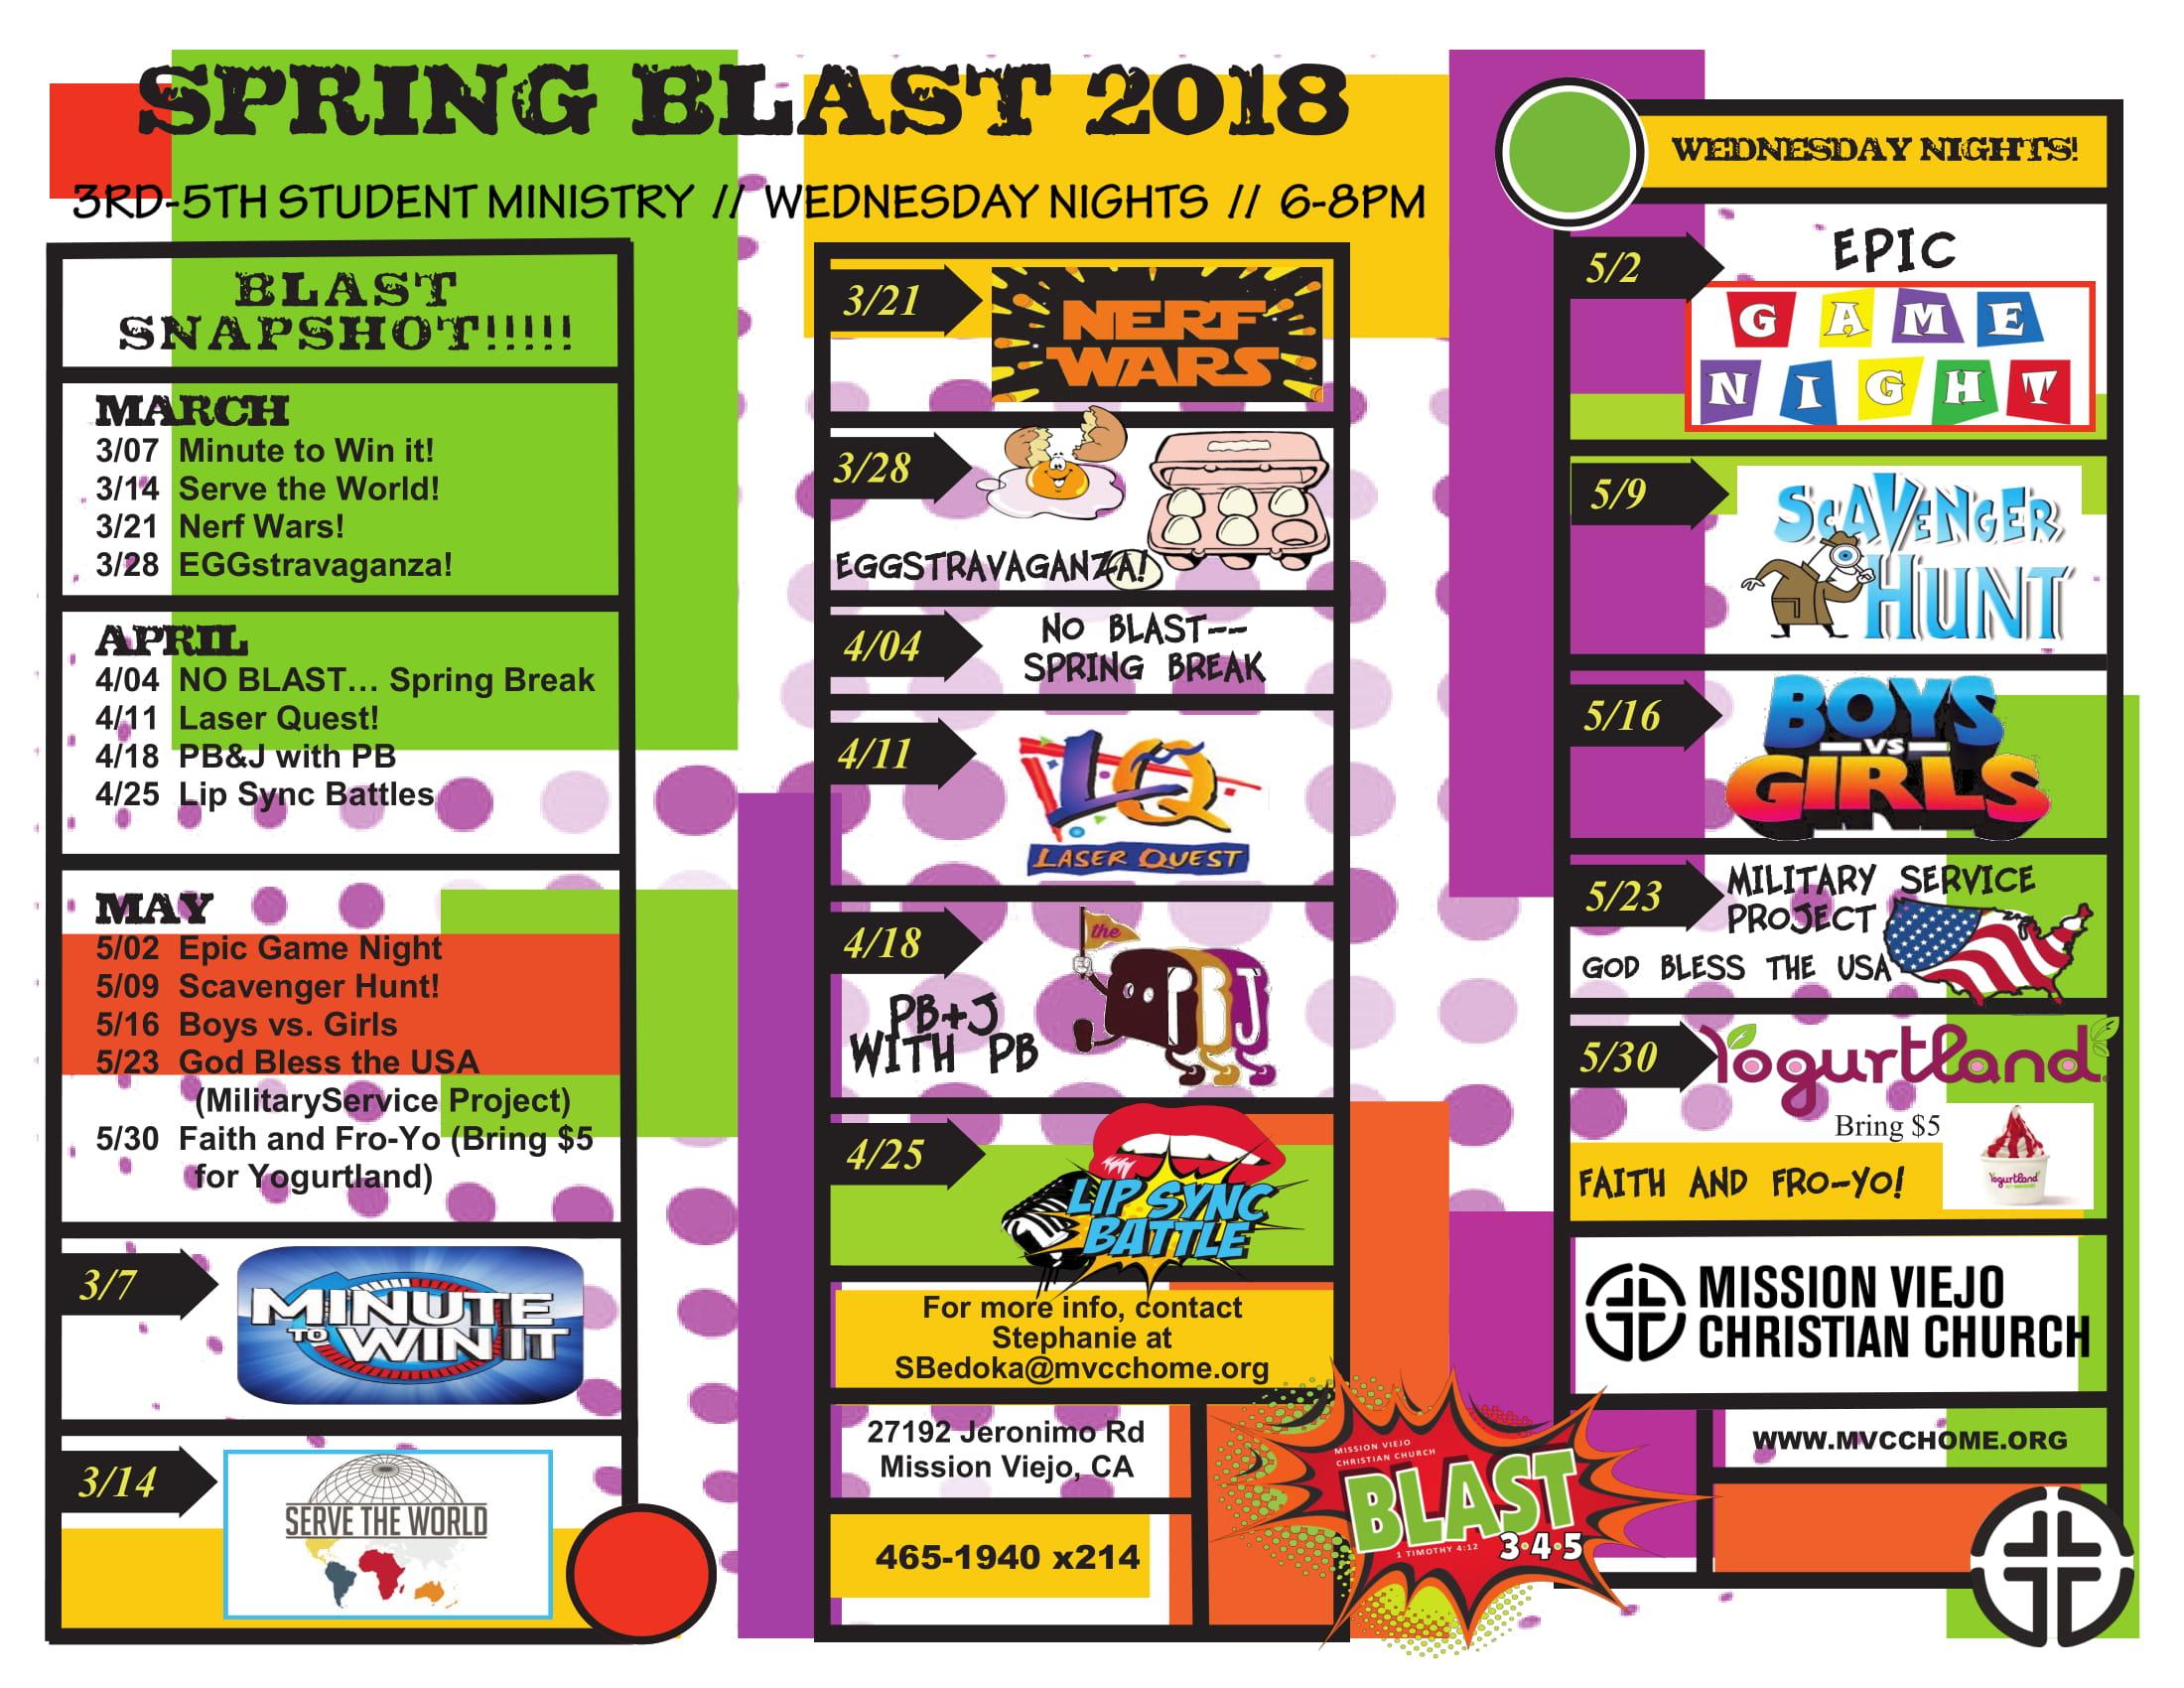 SPRING BLAST 2018 CALENDAR (2)-1.jpg